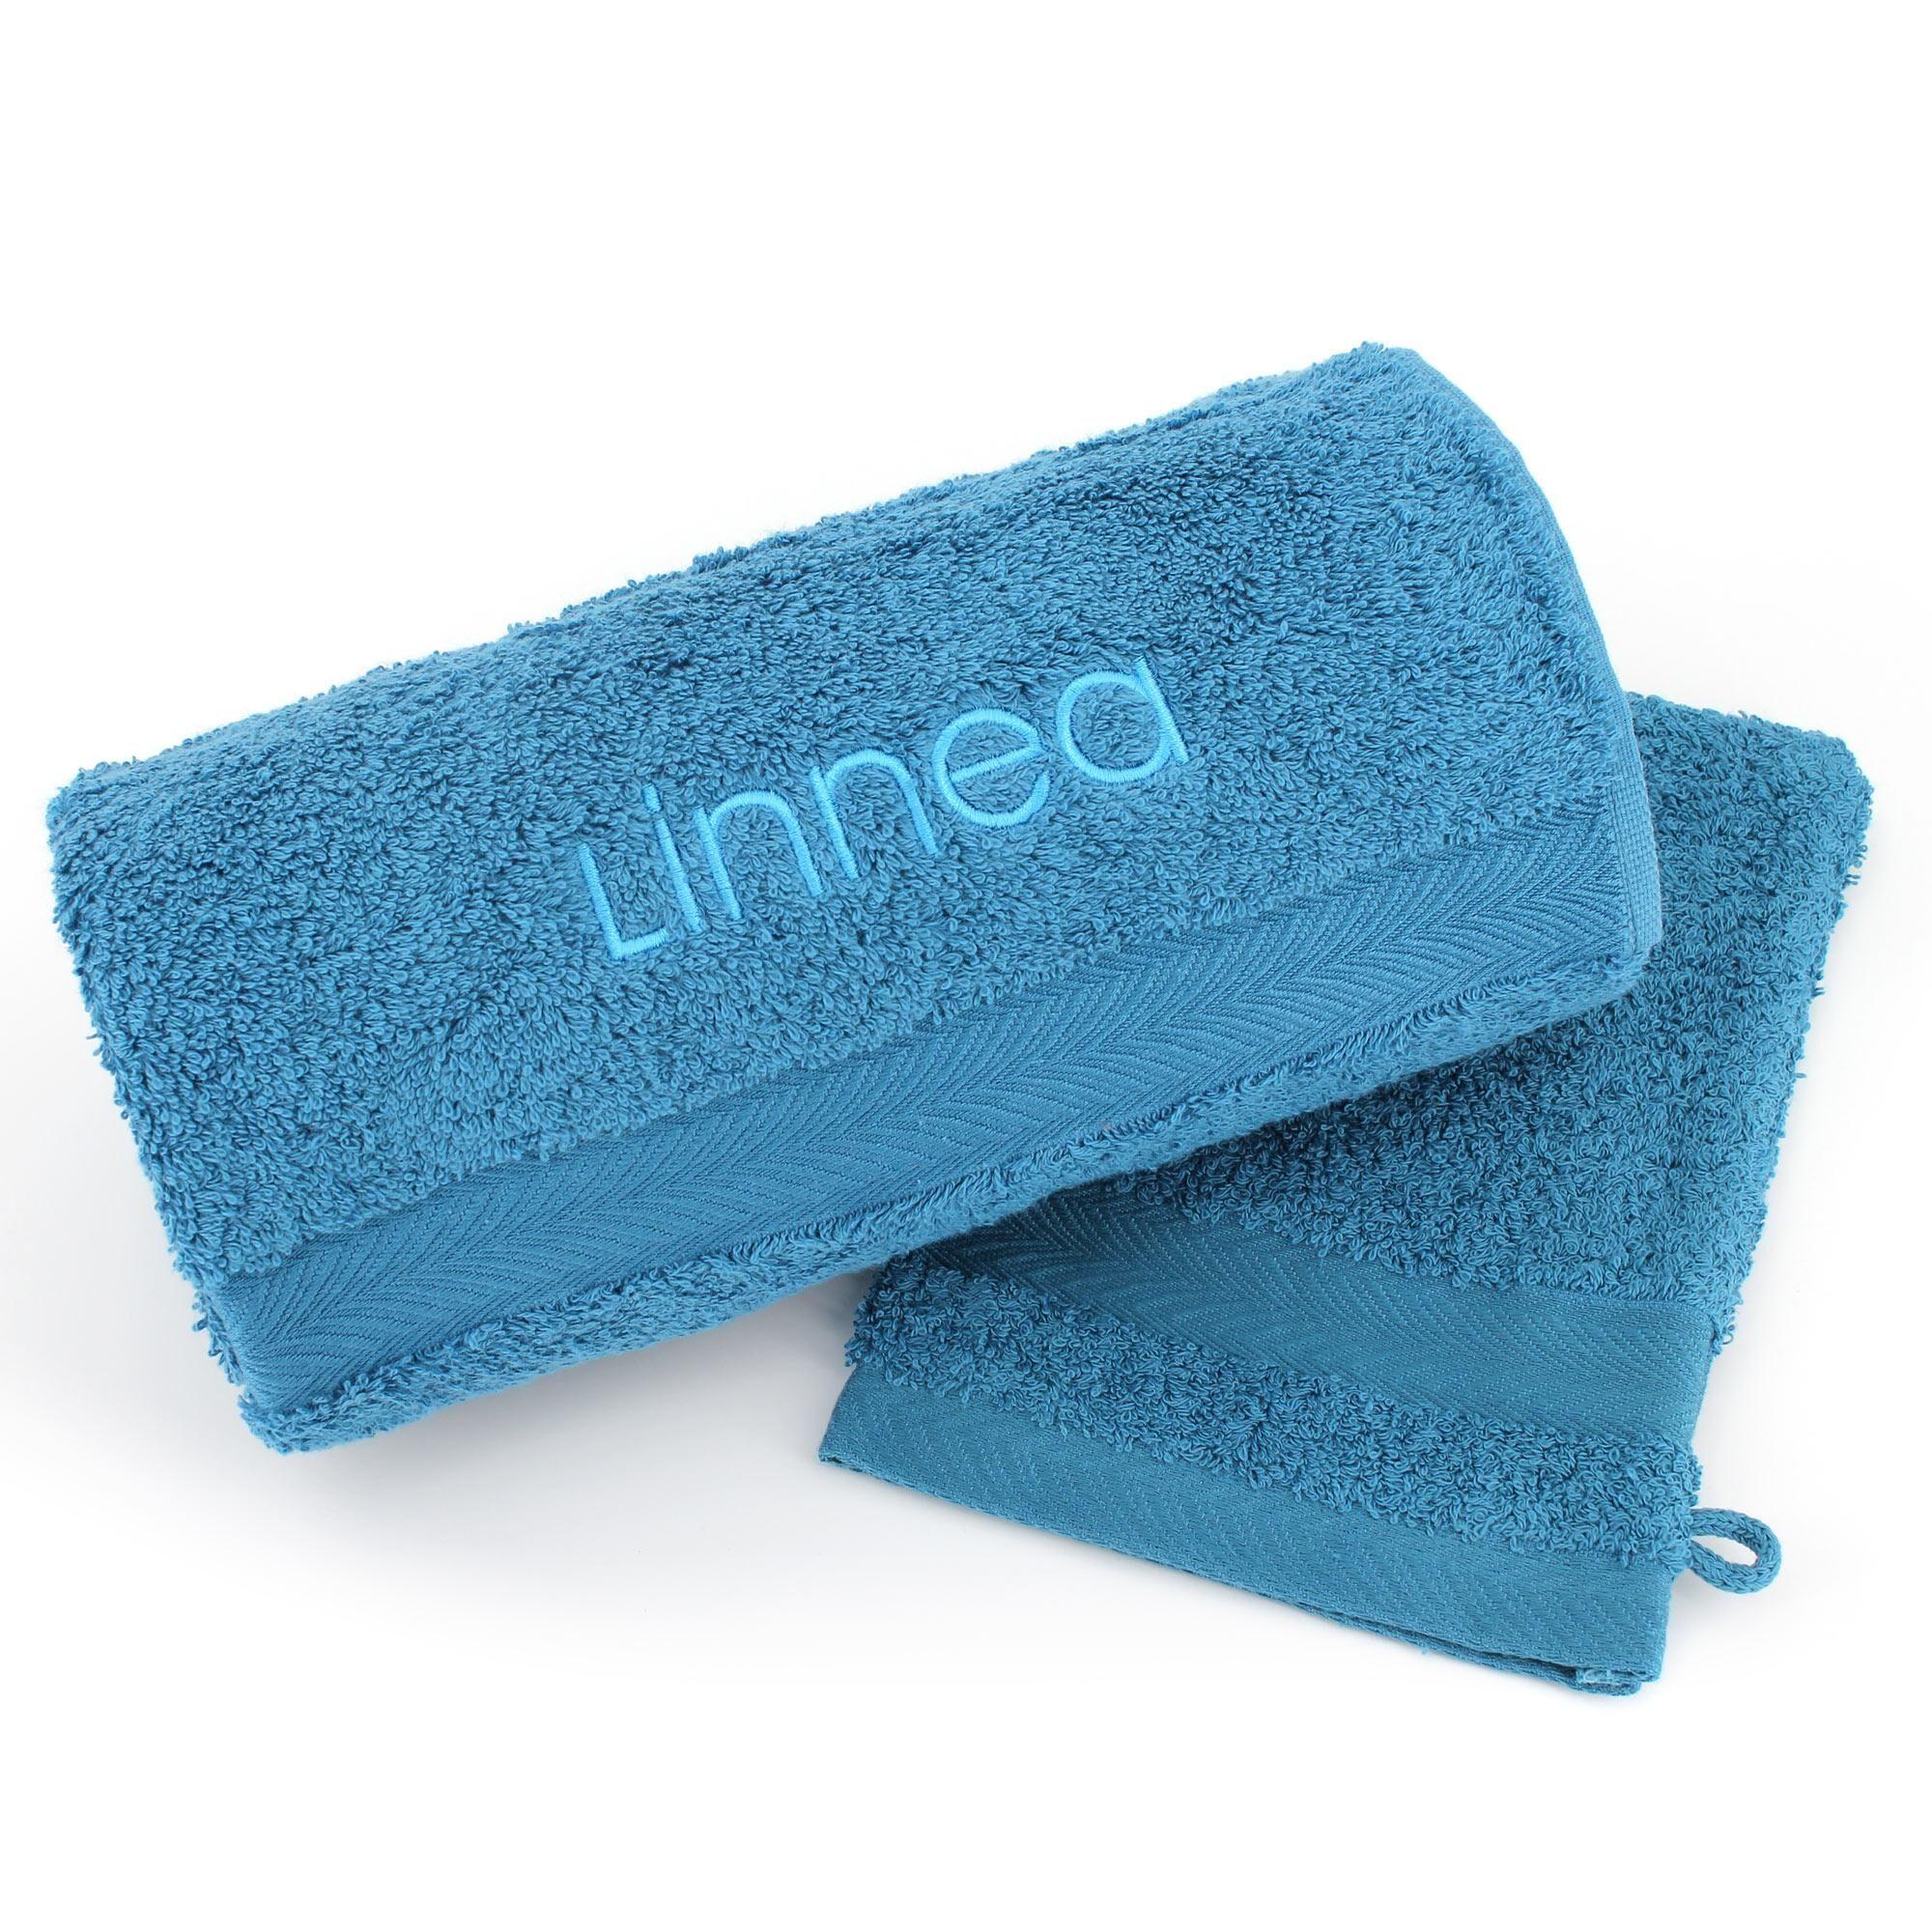 Linnea Lot ROYAL CRESENT Serviette brodée Linnea 50x100 + gant assorti Bleu Céleste